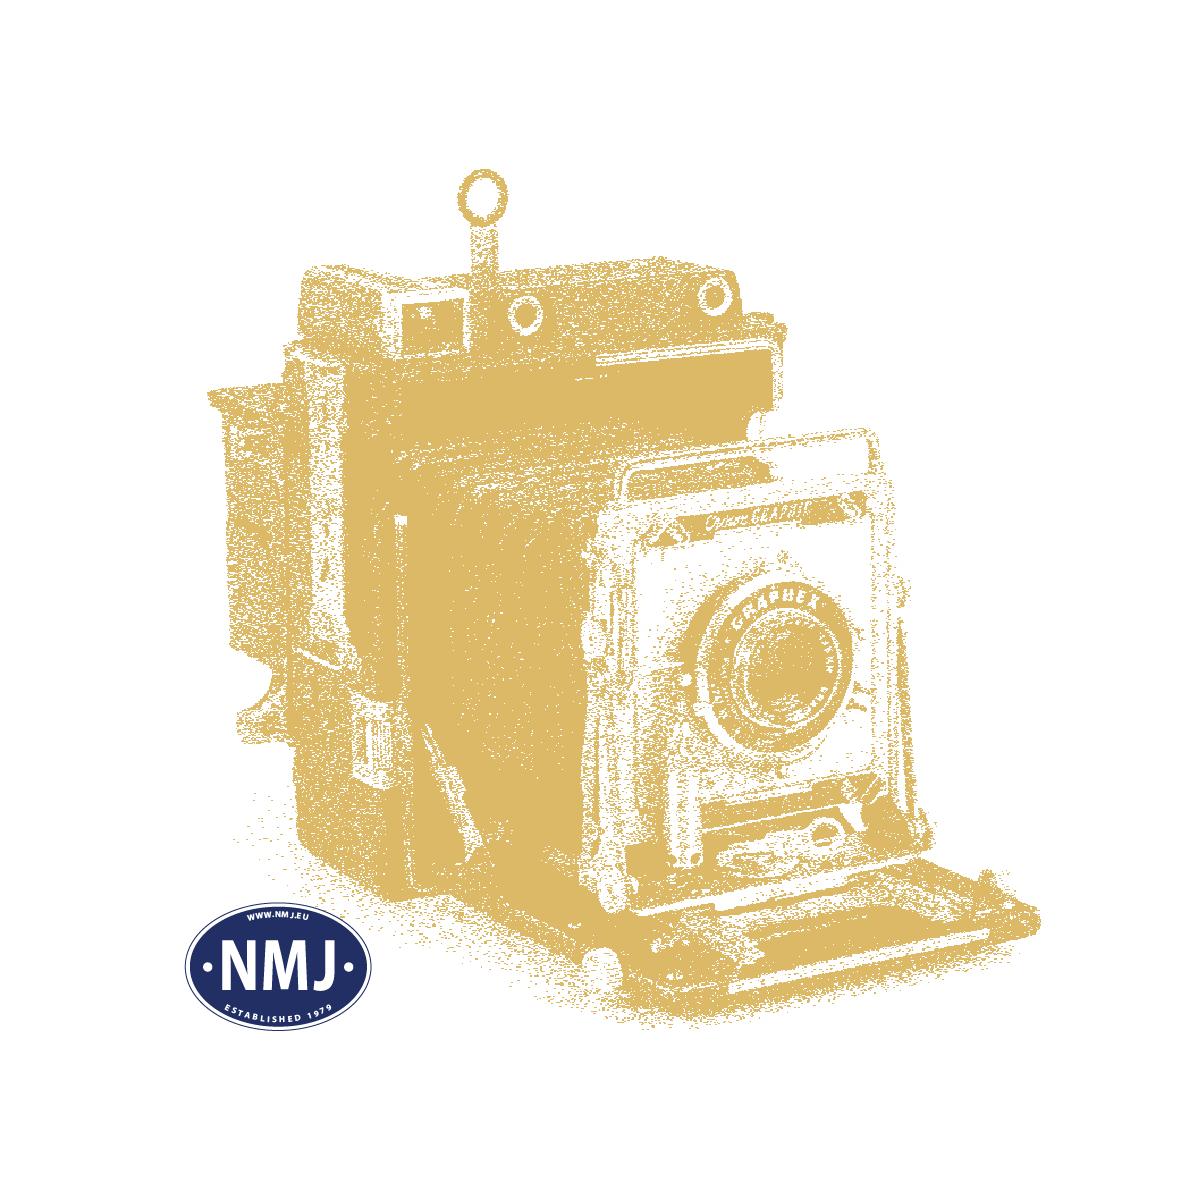 NMJT506.203 - NMJ Topline NSB Gbs 150 0 021-3